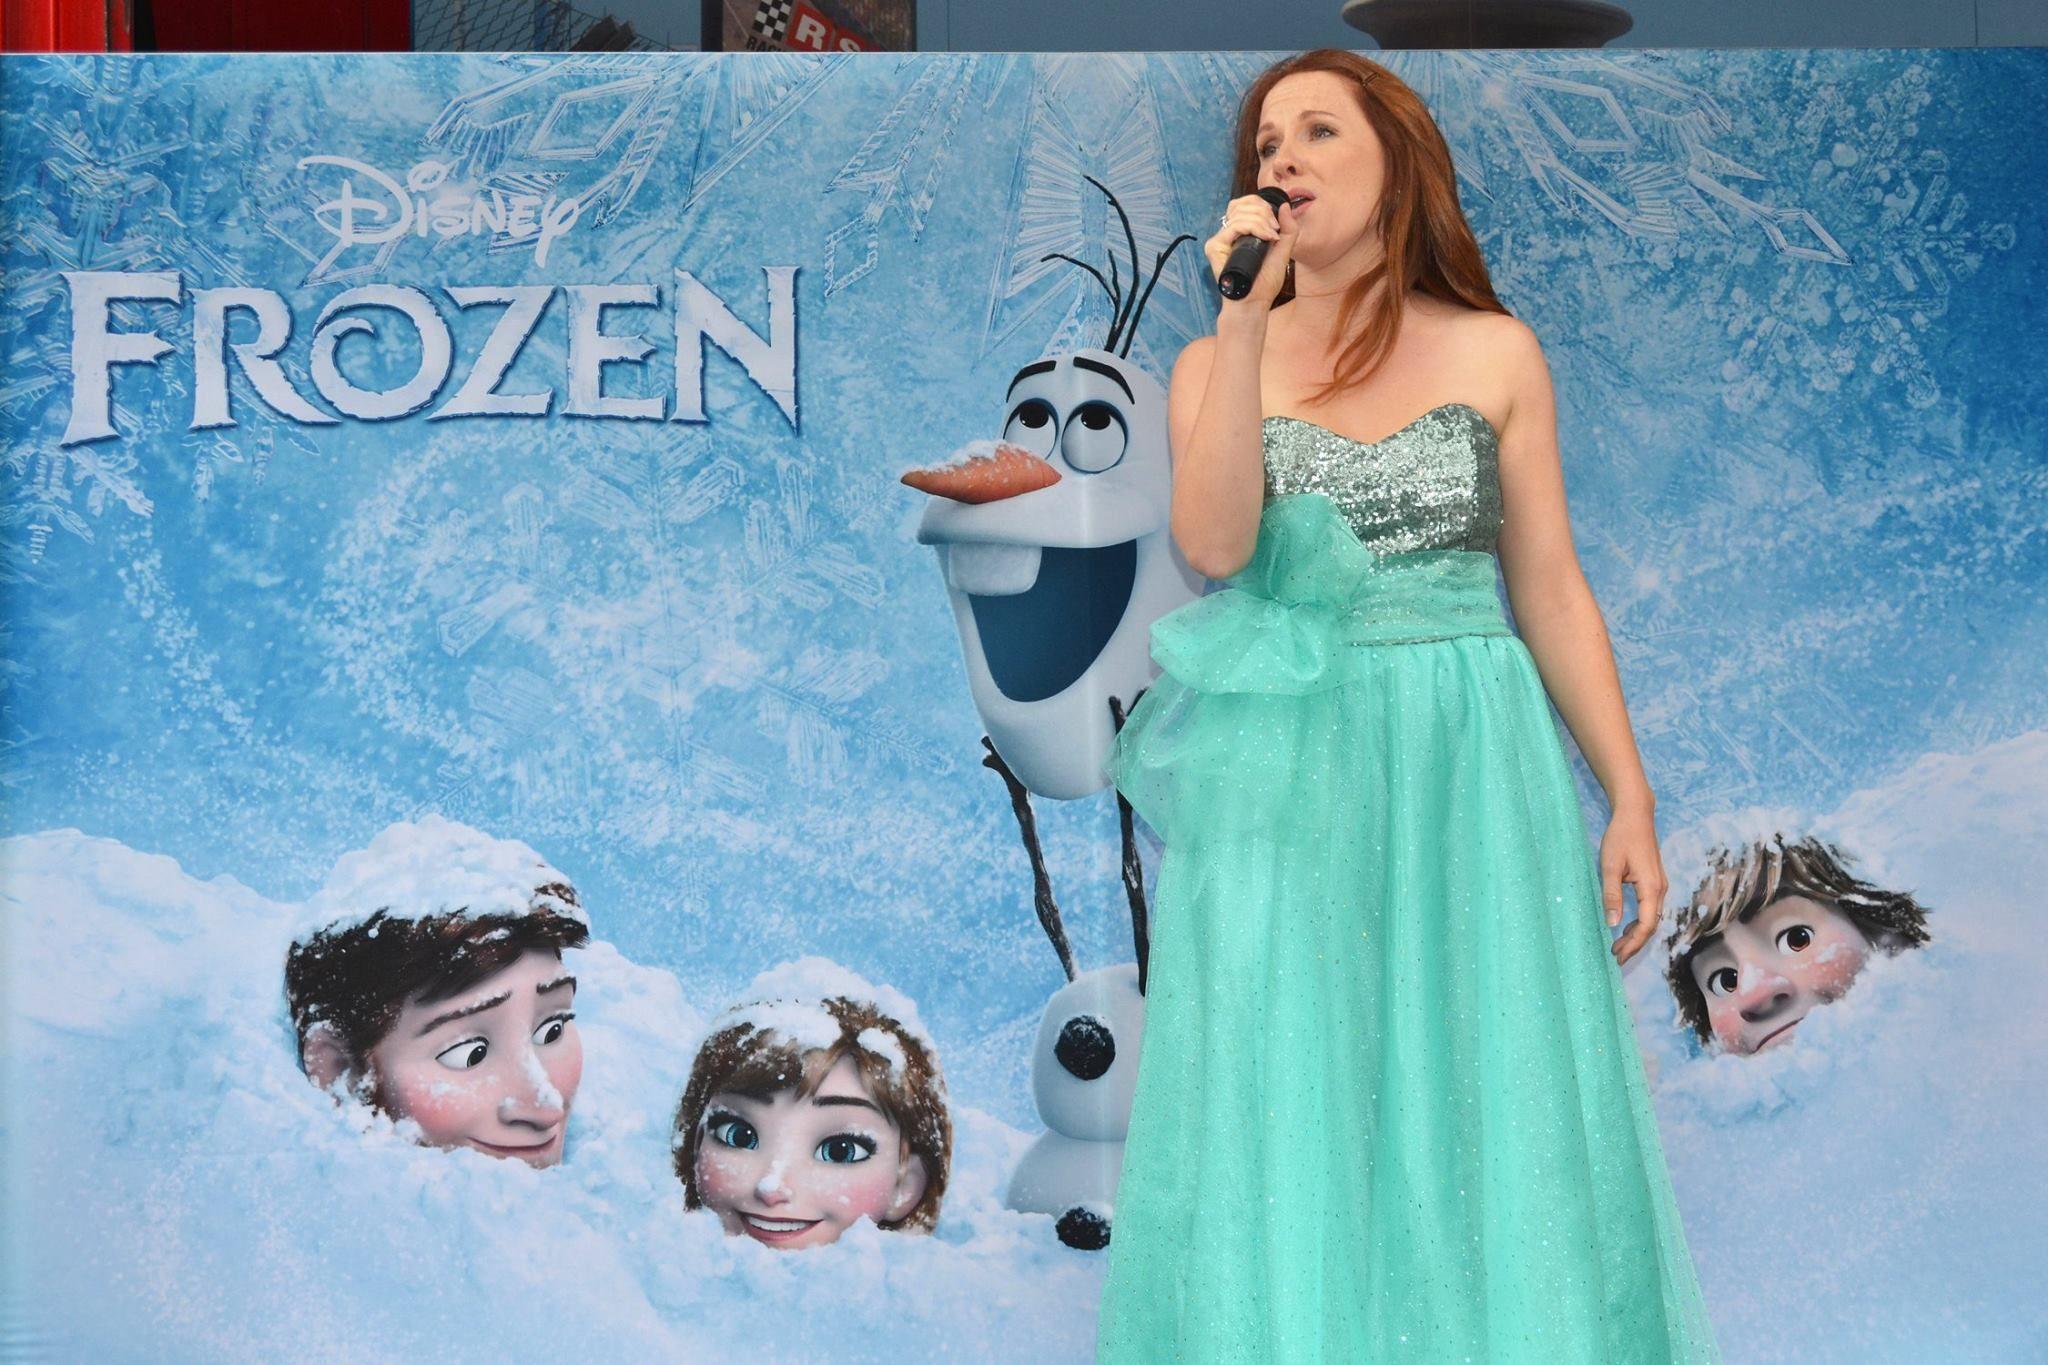 VERITY HUNT-BALLARD OPENS DISNEY'S FROZEN Verity Hunt-Ballard opens Disney's Frozen at The Melbourne Star wearing the Bethany Bow Gown